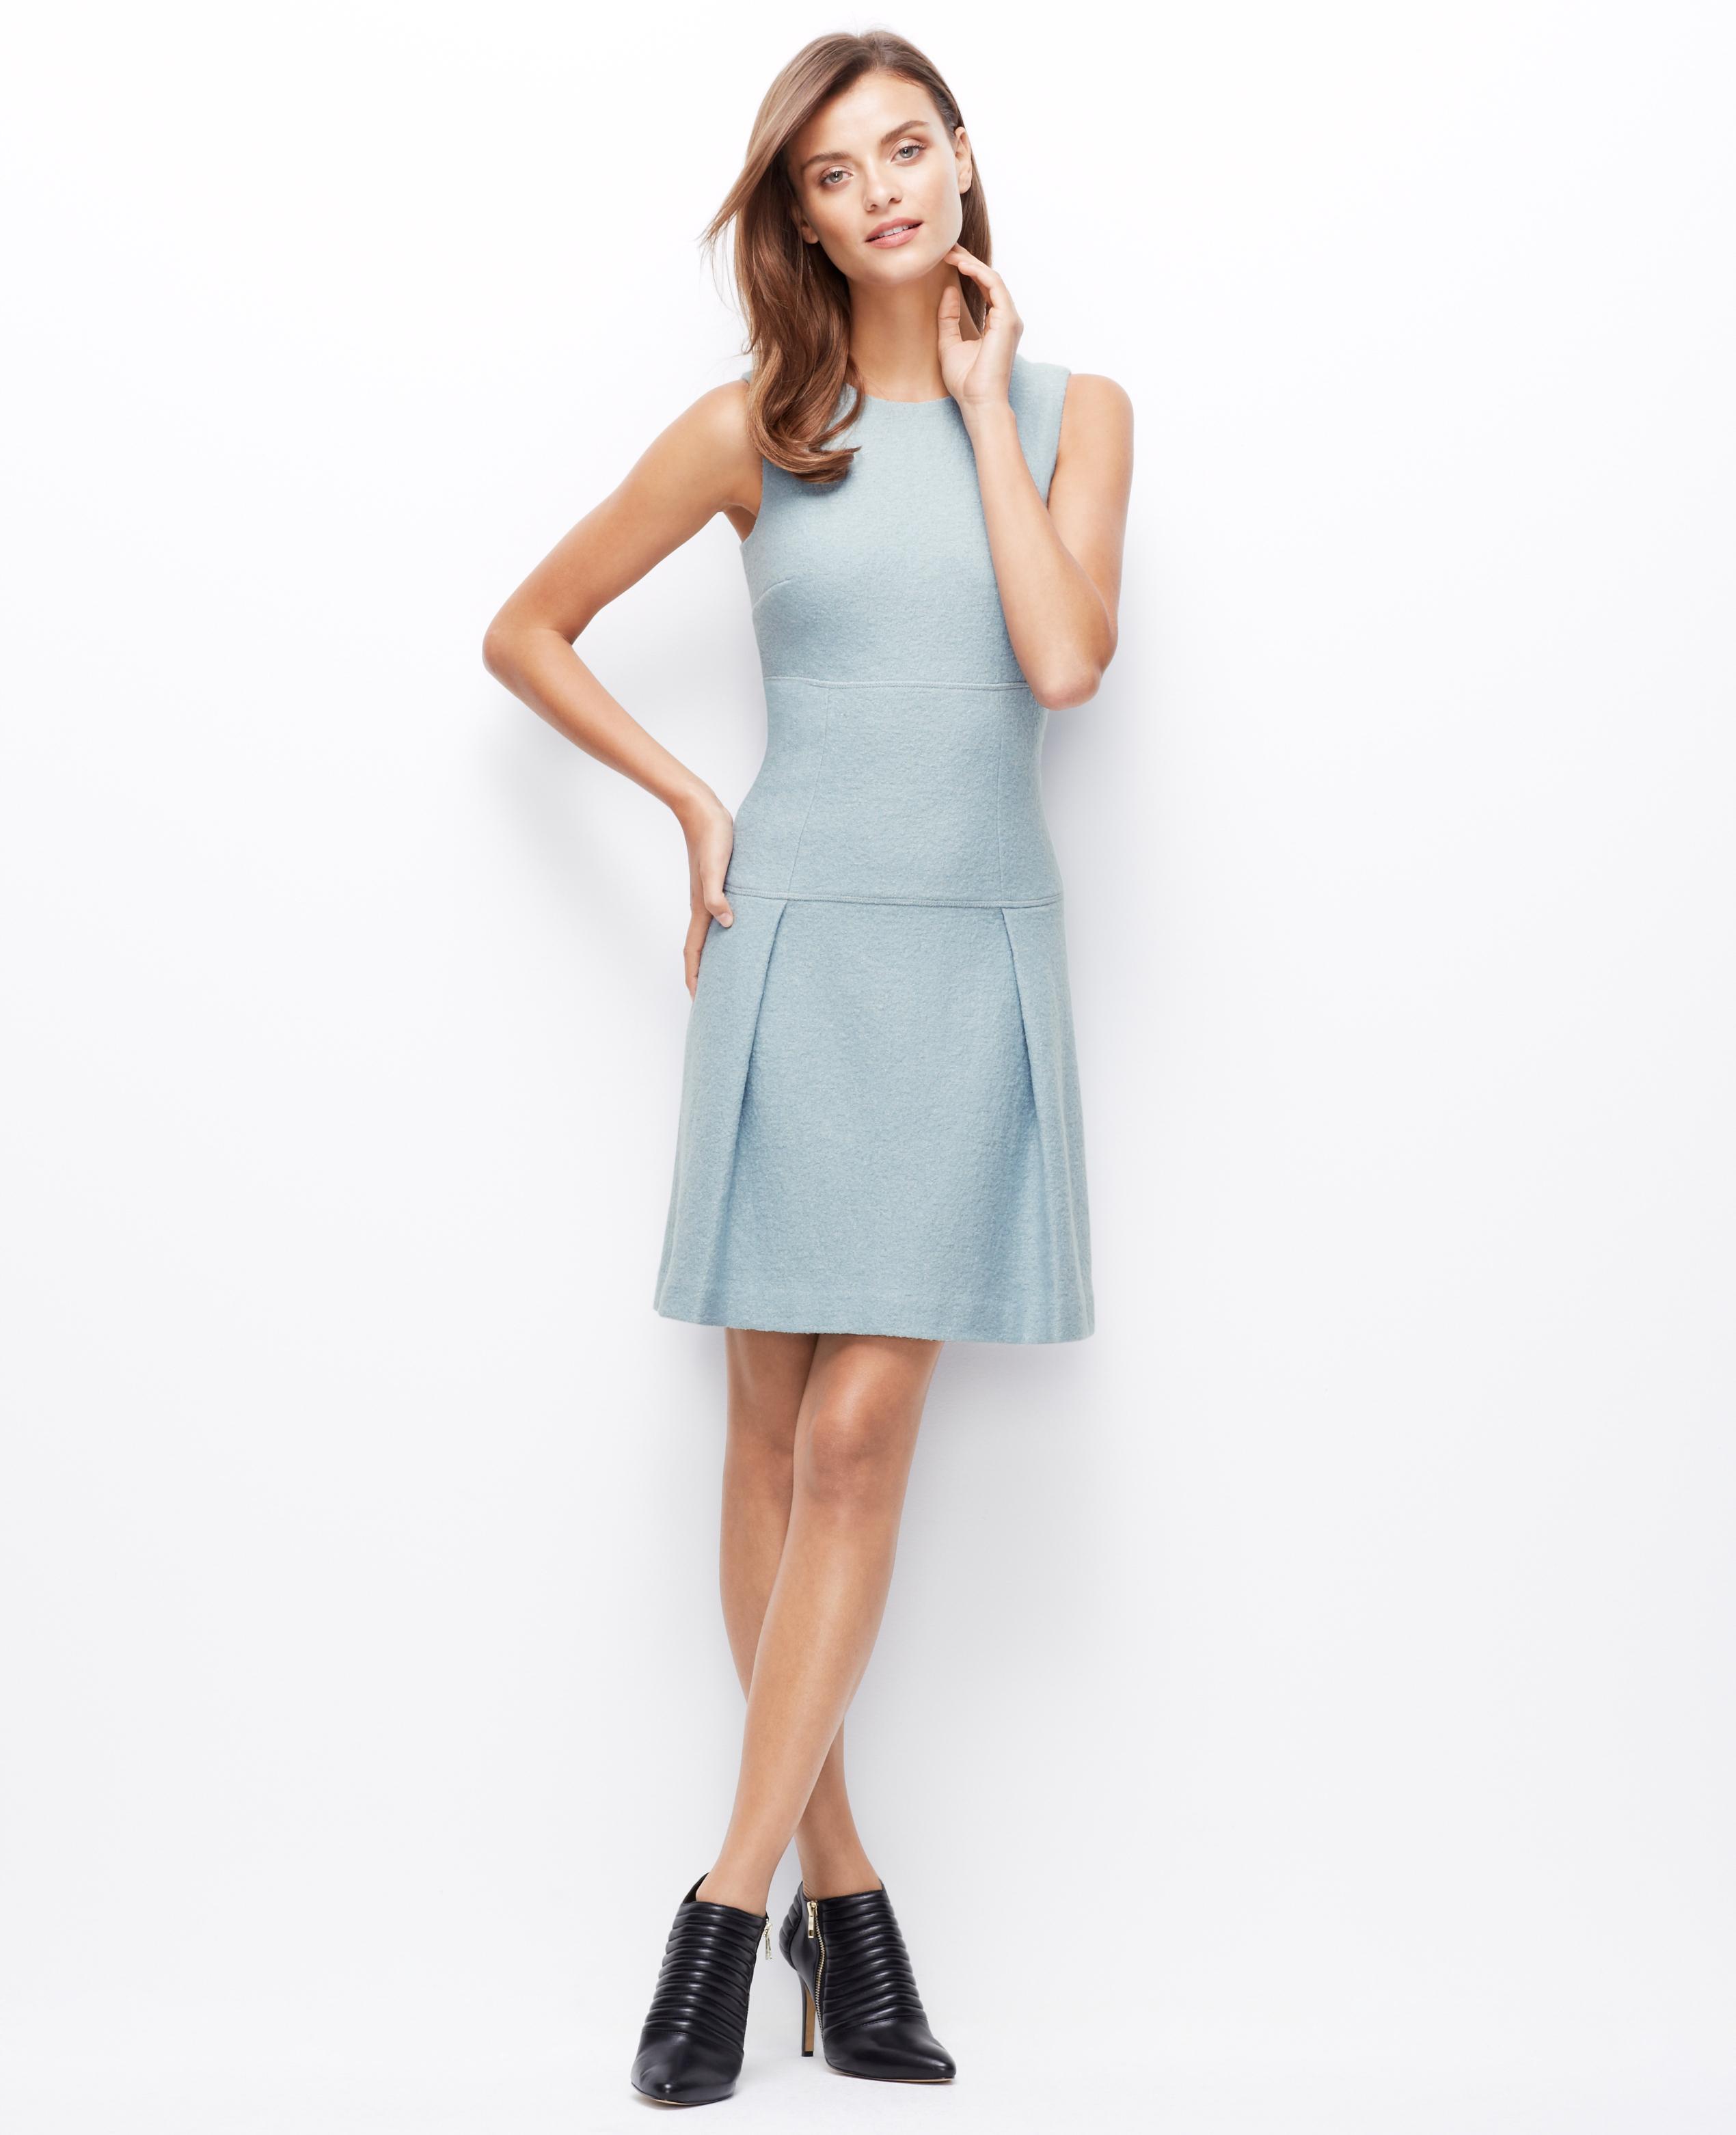 Lyst - Ann Taylor Petite Boiled Wool Drop Waist Dress